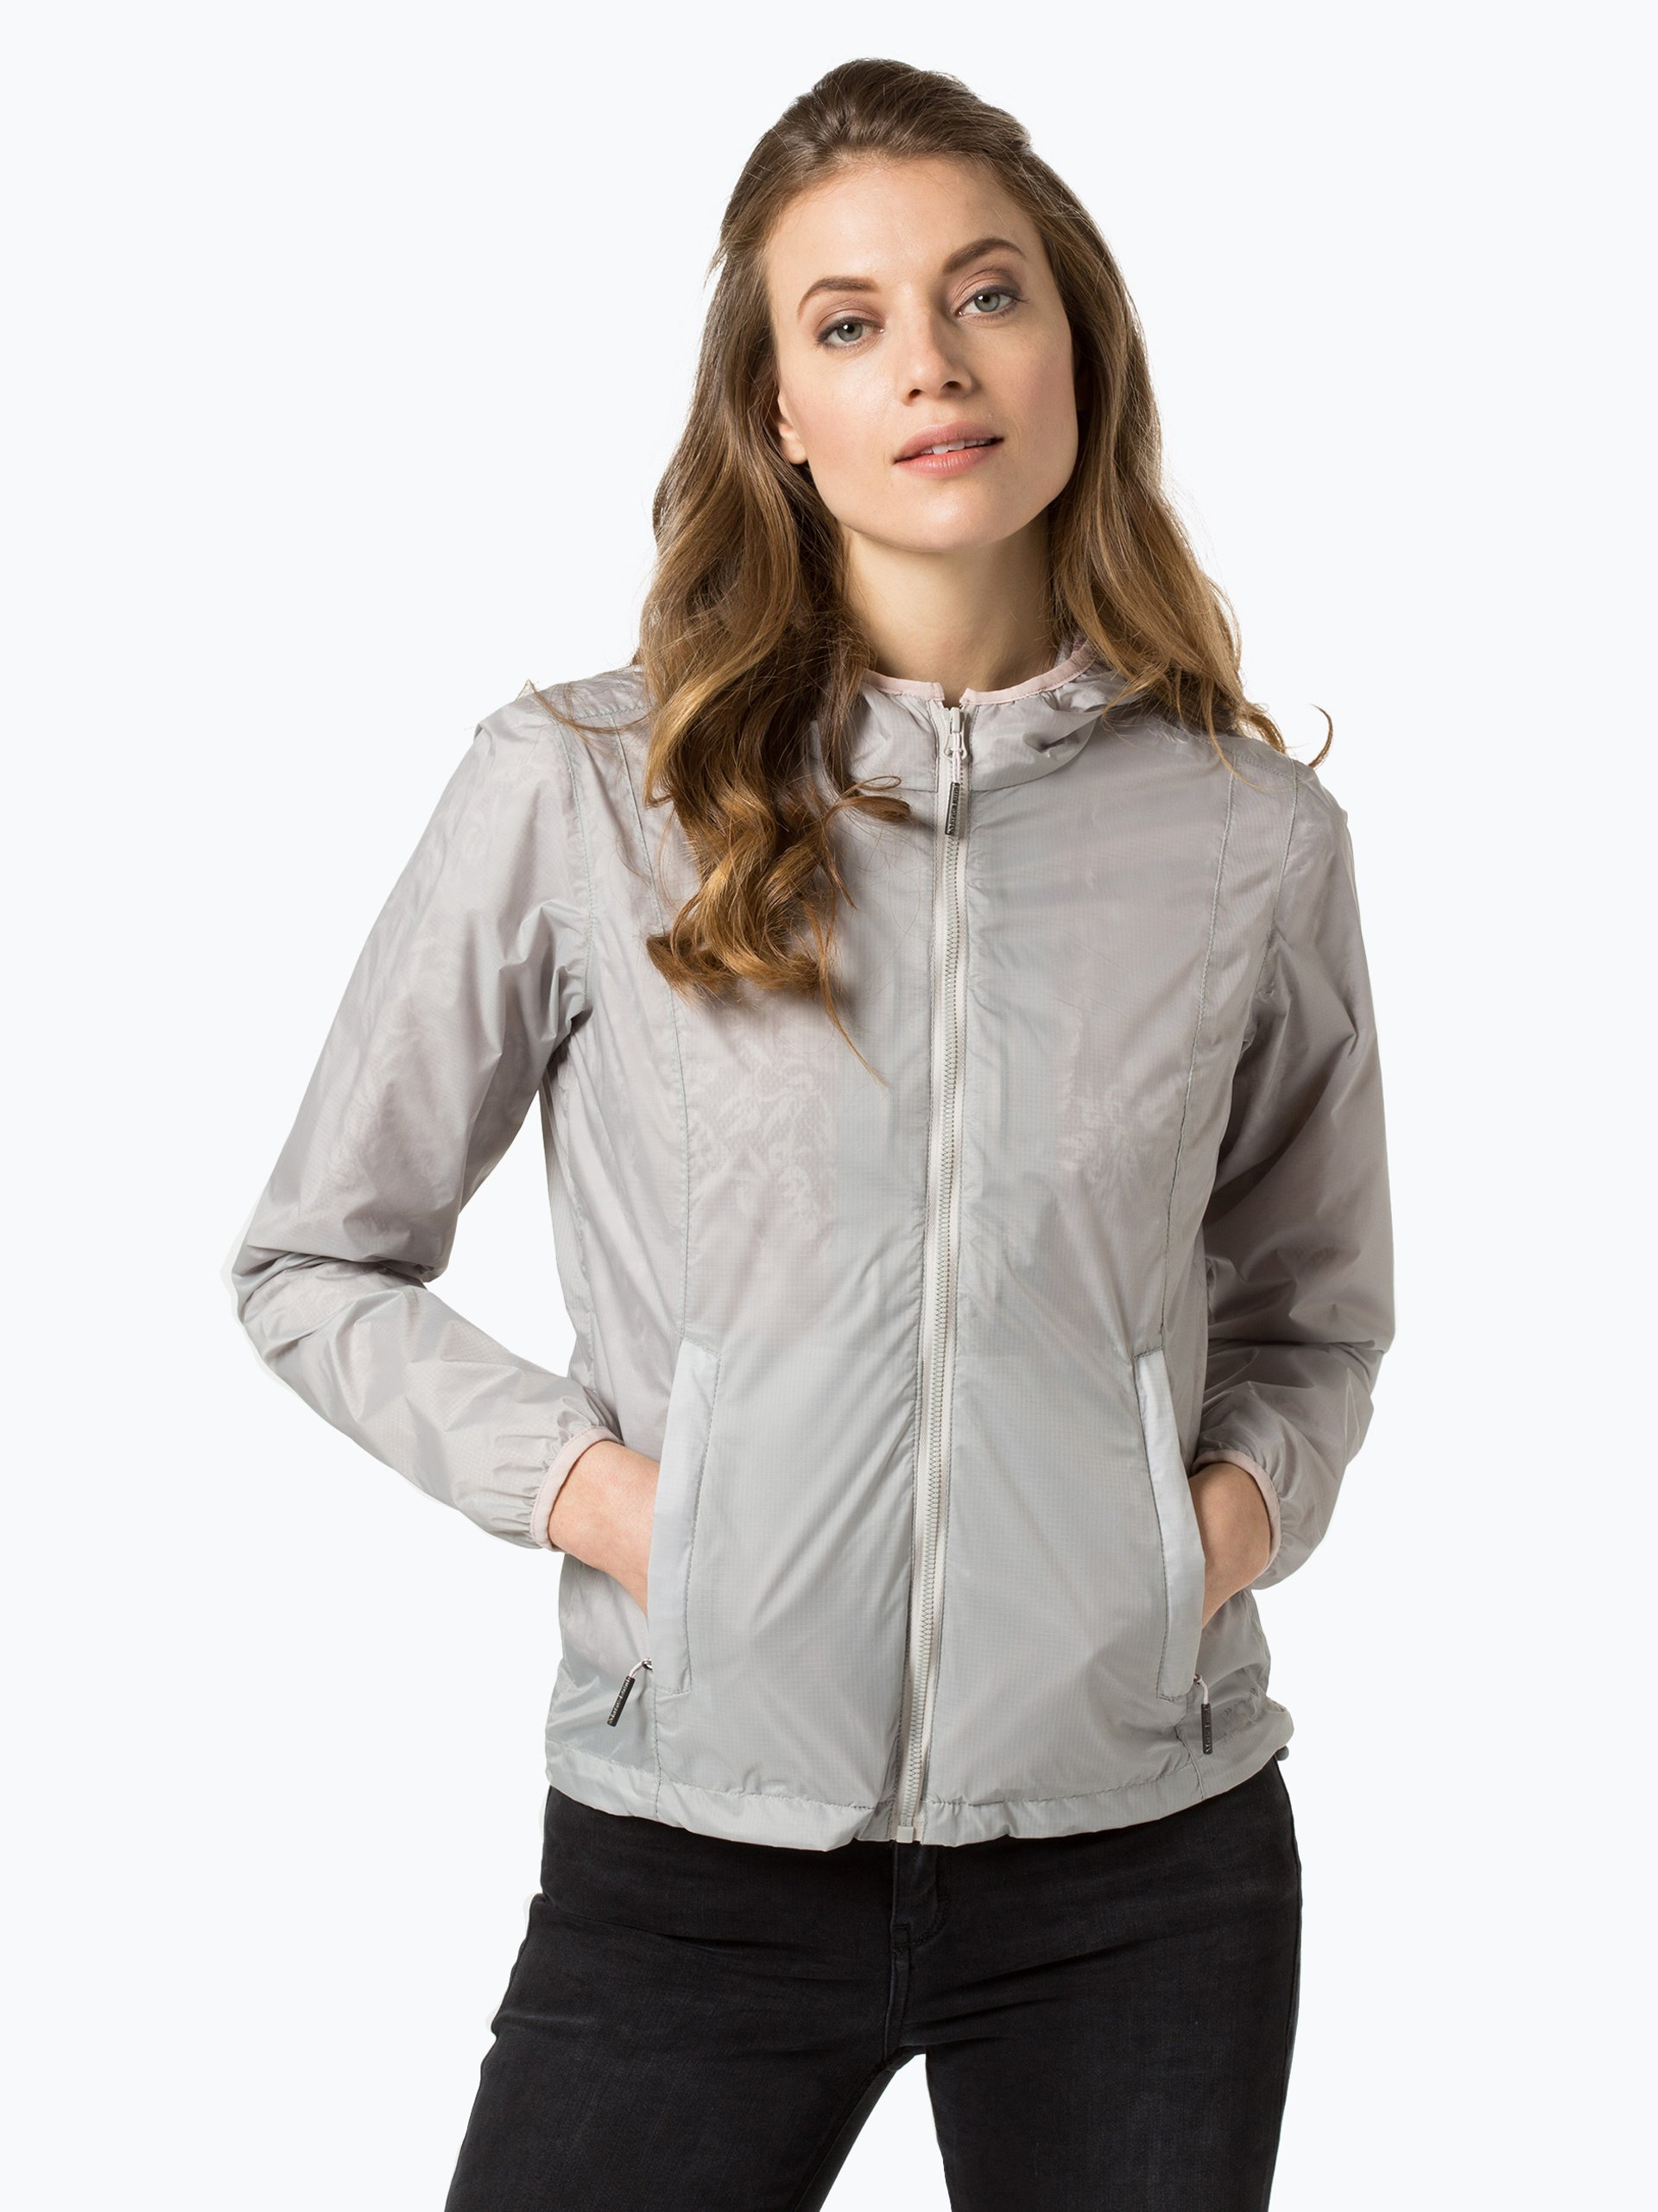 marie lund damen sportswear jacke silber kariert online kaufen vangraaf com. Black Bedroom Furniture Sets. Home Design Ideas